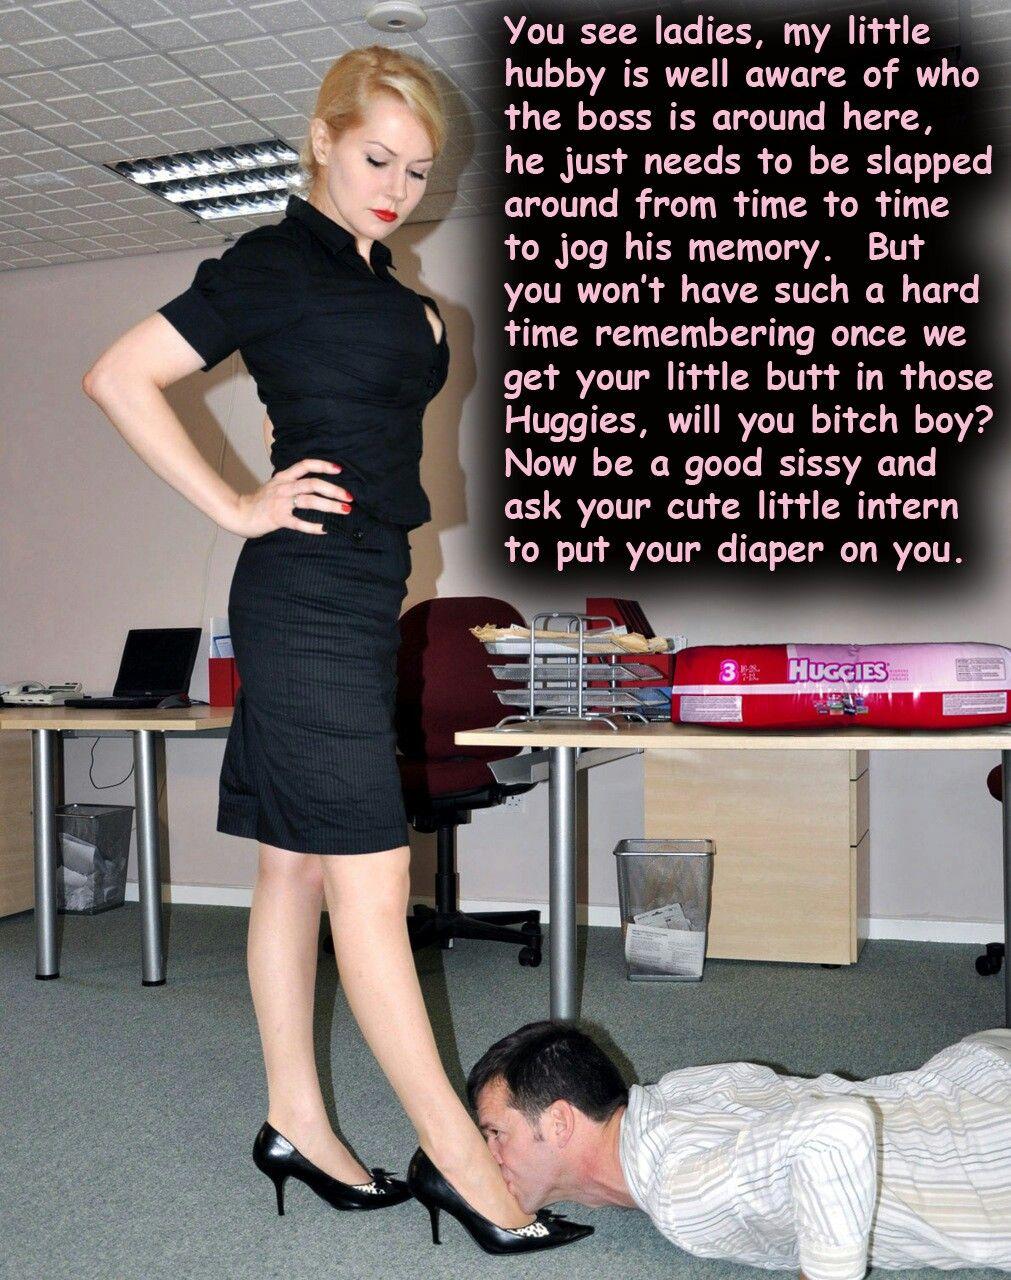 bosses the mercy Secretary at captions of